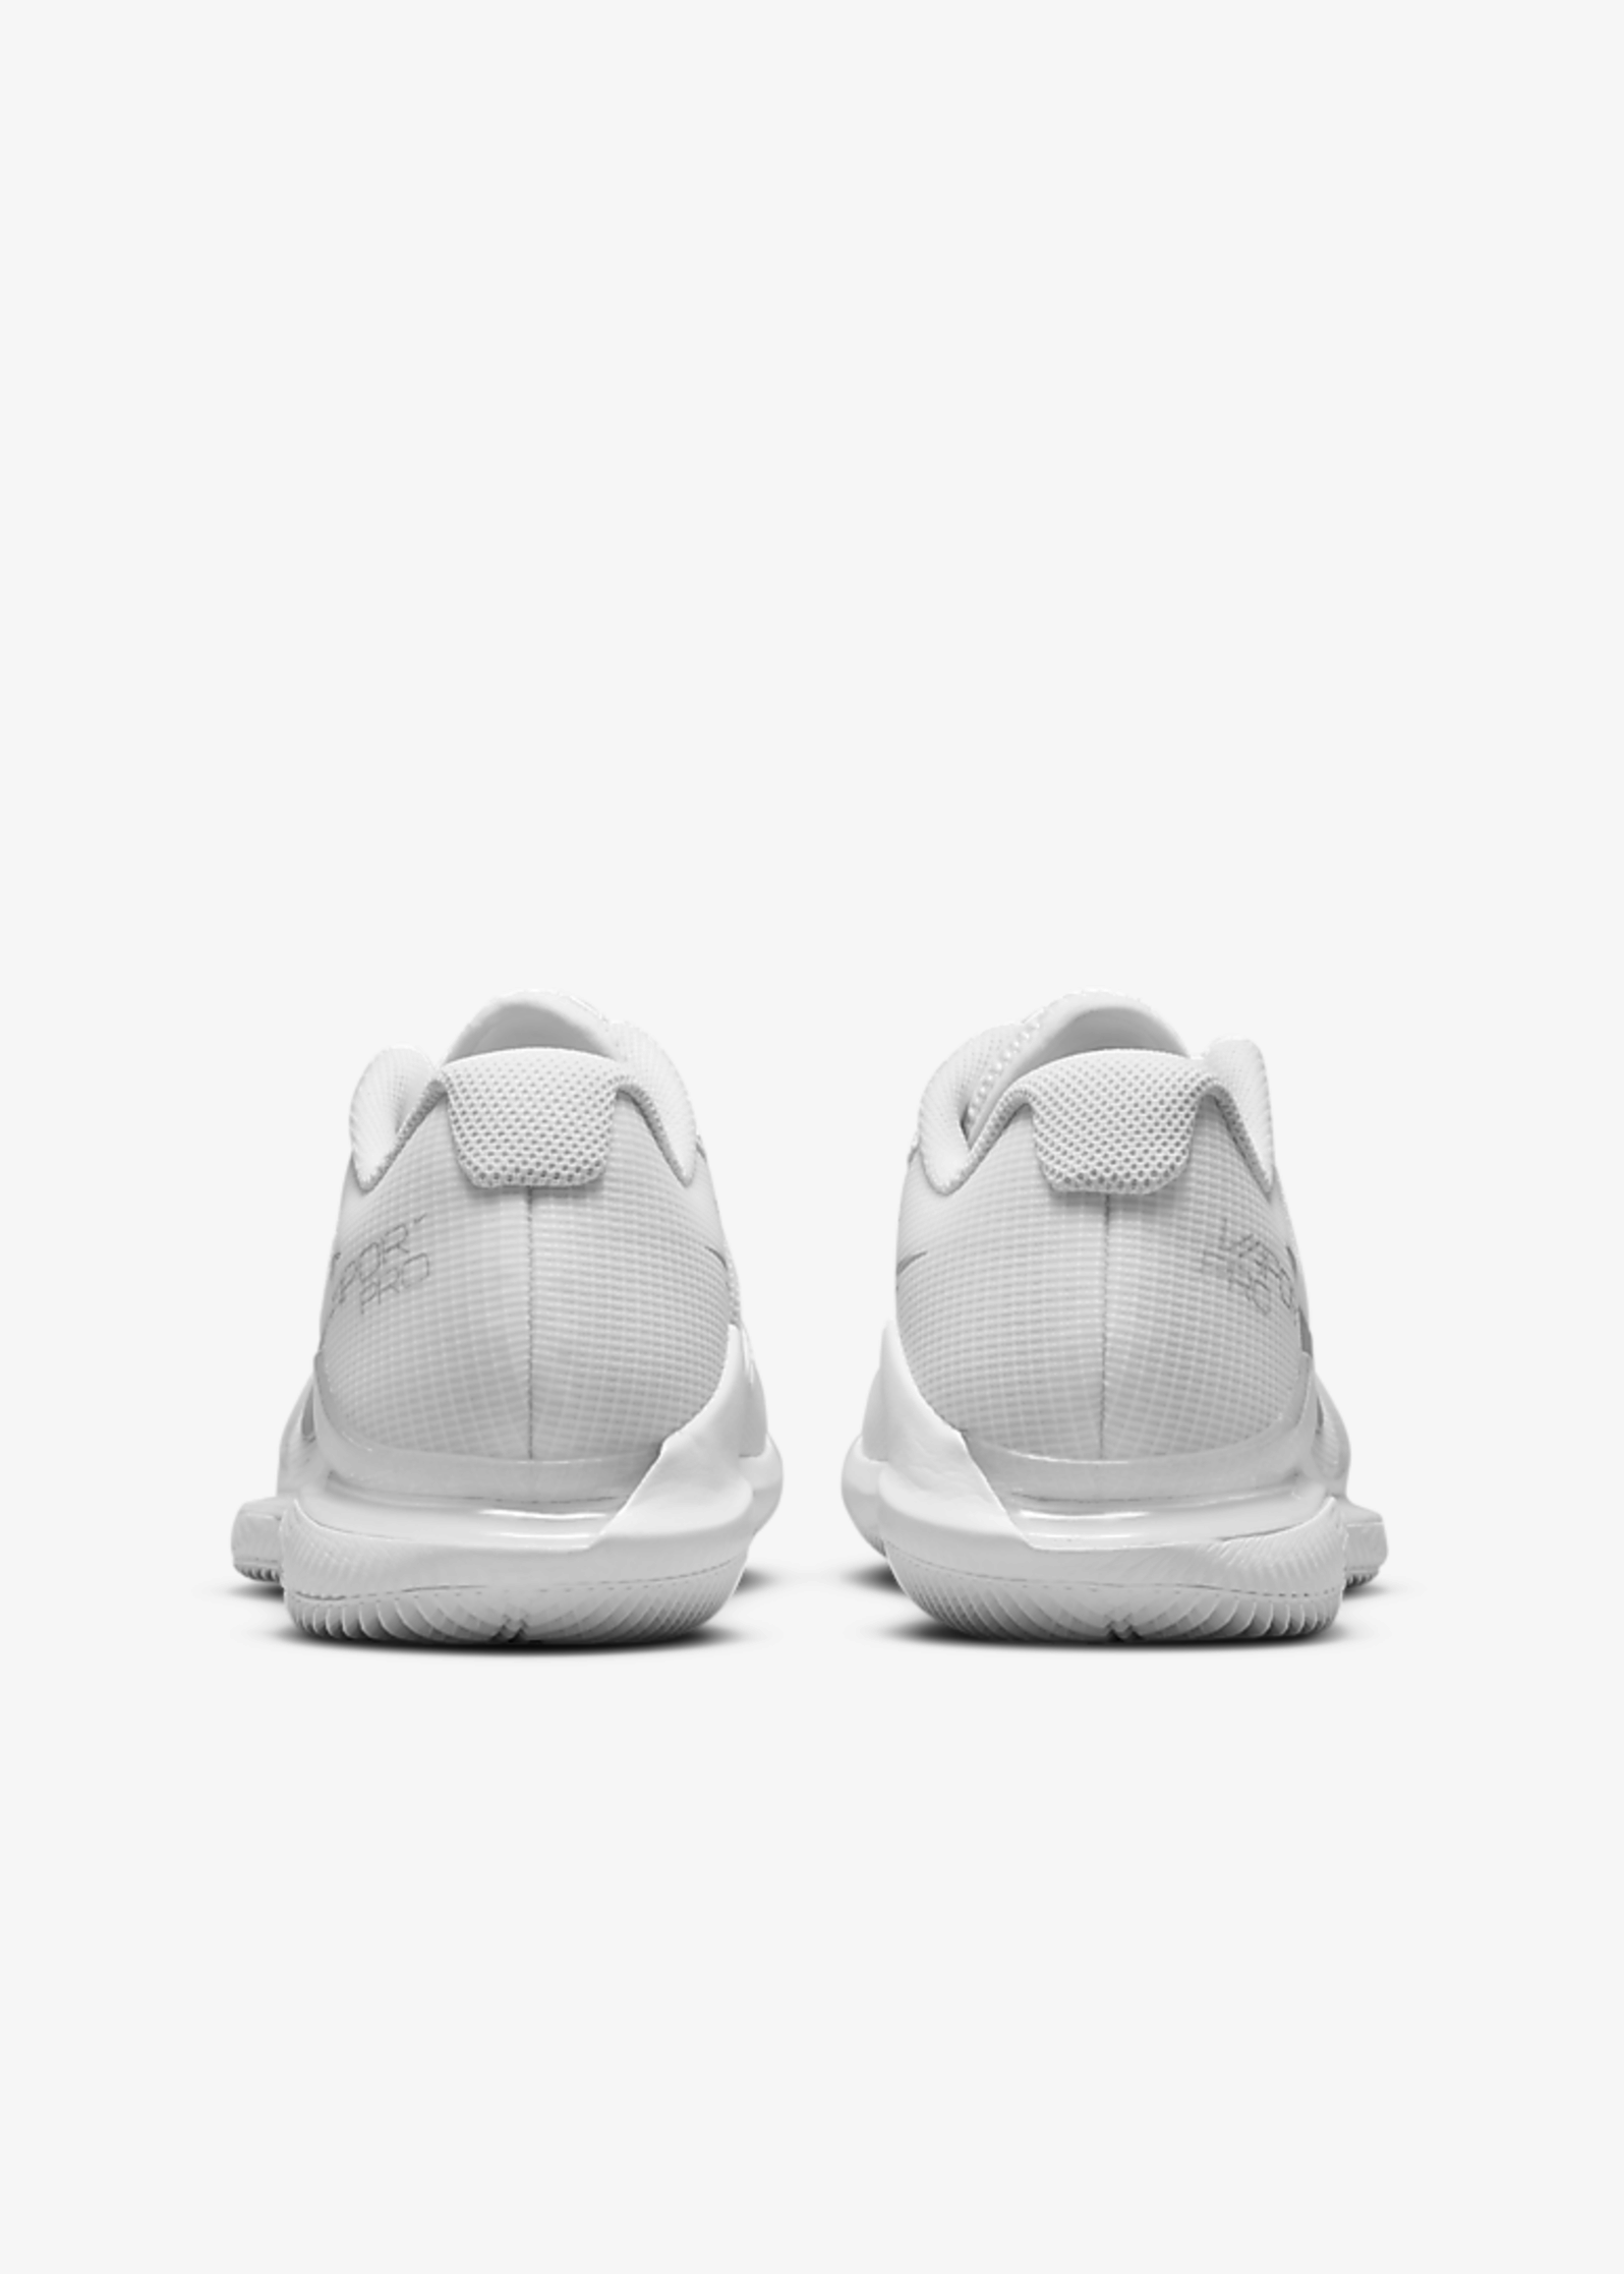 Nike WOMEN'S NIKECOURT AIR ZOOM VAPOR PRO CZ0222